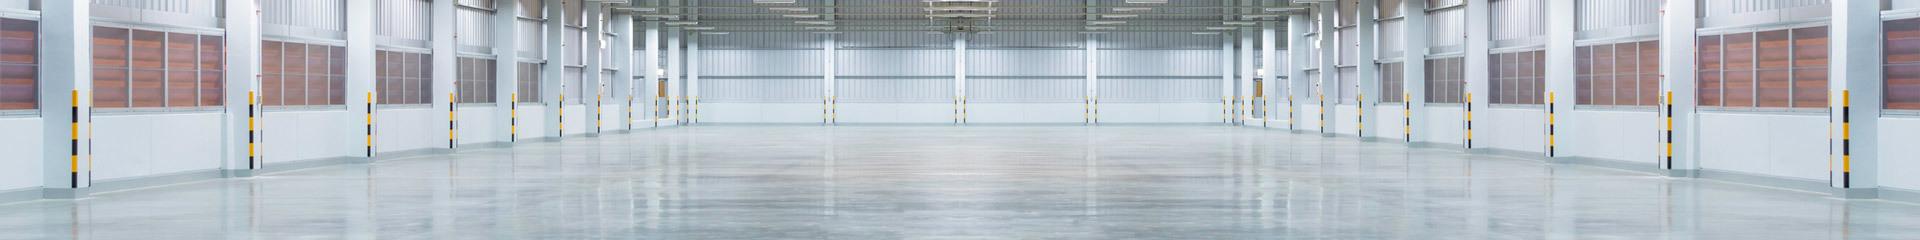 Warehouses, Loading Docks & Storage Facilities